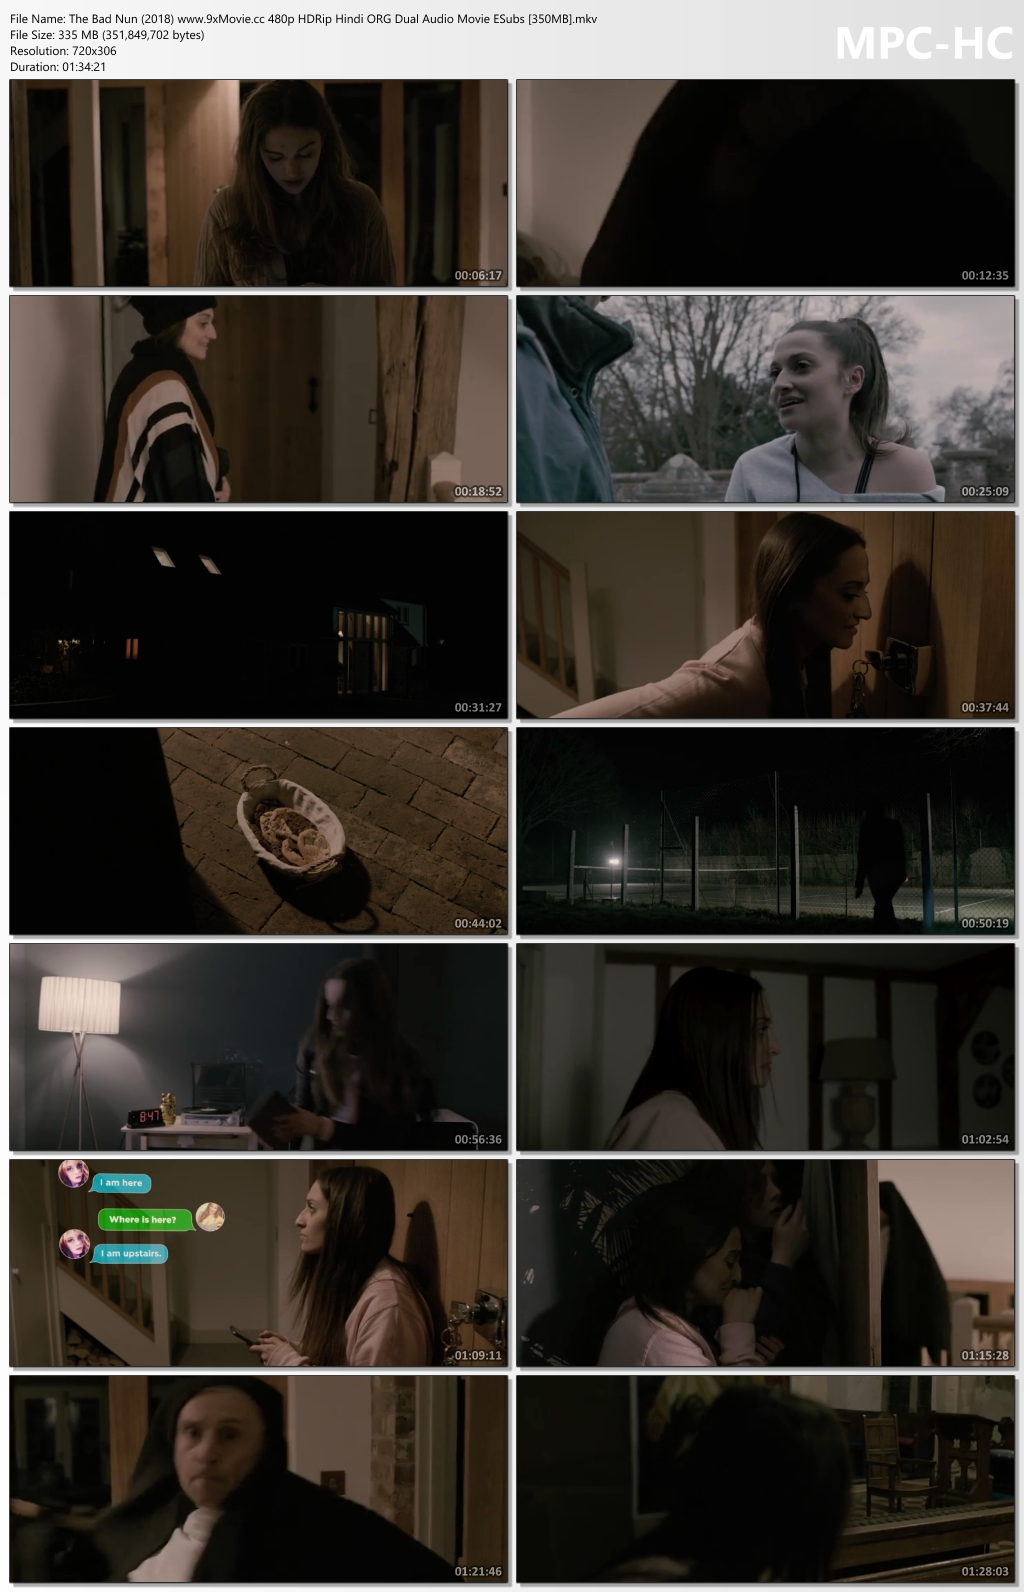 The-Bad-Nun-2018-www-9x-Movie-cc-480p-HDRip-Hindi-ORG-Dual-Audio-Movie-ESubs-350-MB-mkv